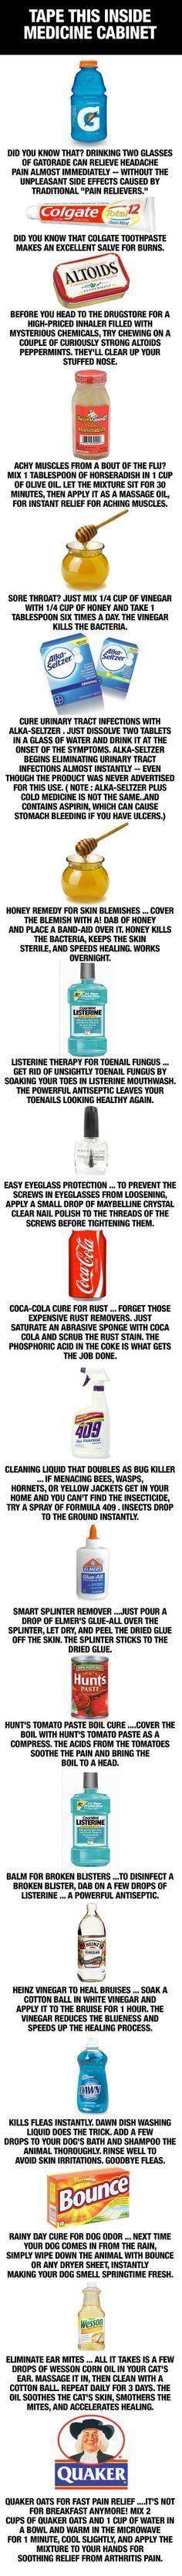 Tape this inside medicine medicine cabinet